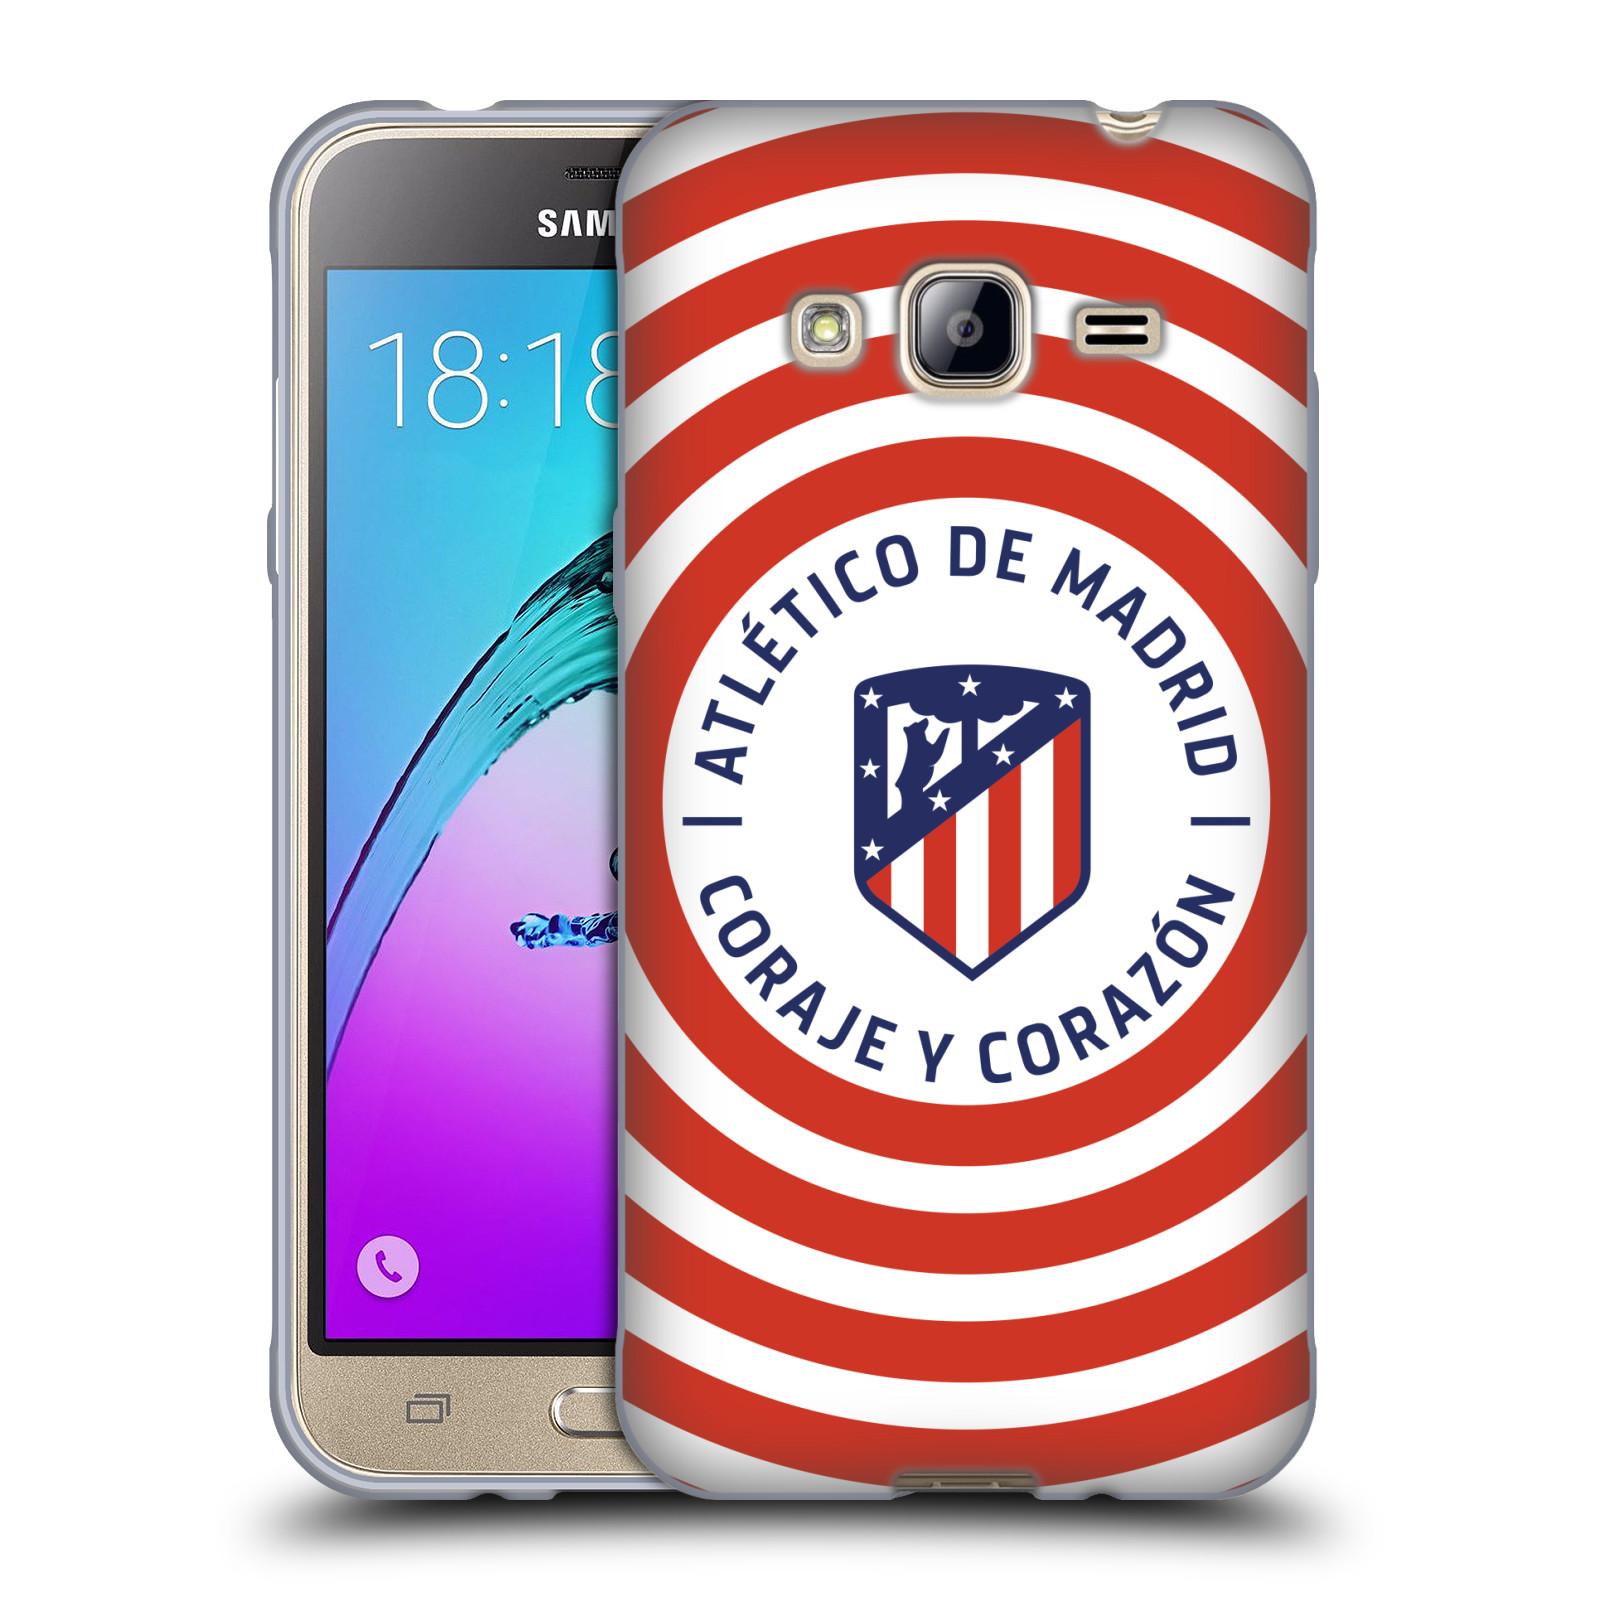 ATLETICO-MADRID-2017-18-CRETE-ETUI-COQUE-EN-GEL-MOLLE-POUR-SAMSUNG-TELEPHONES-3